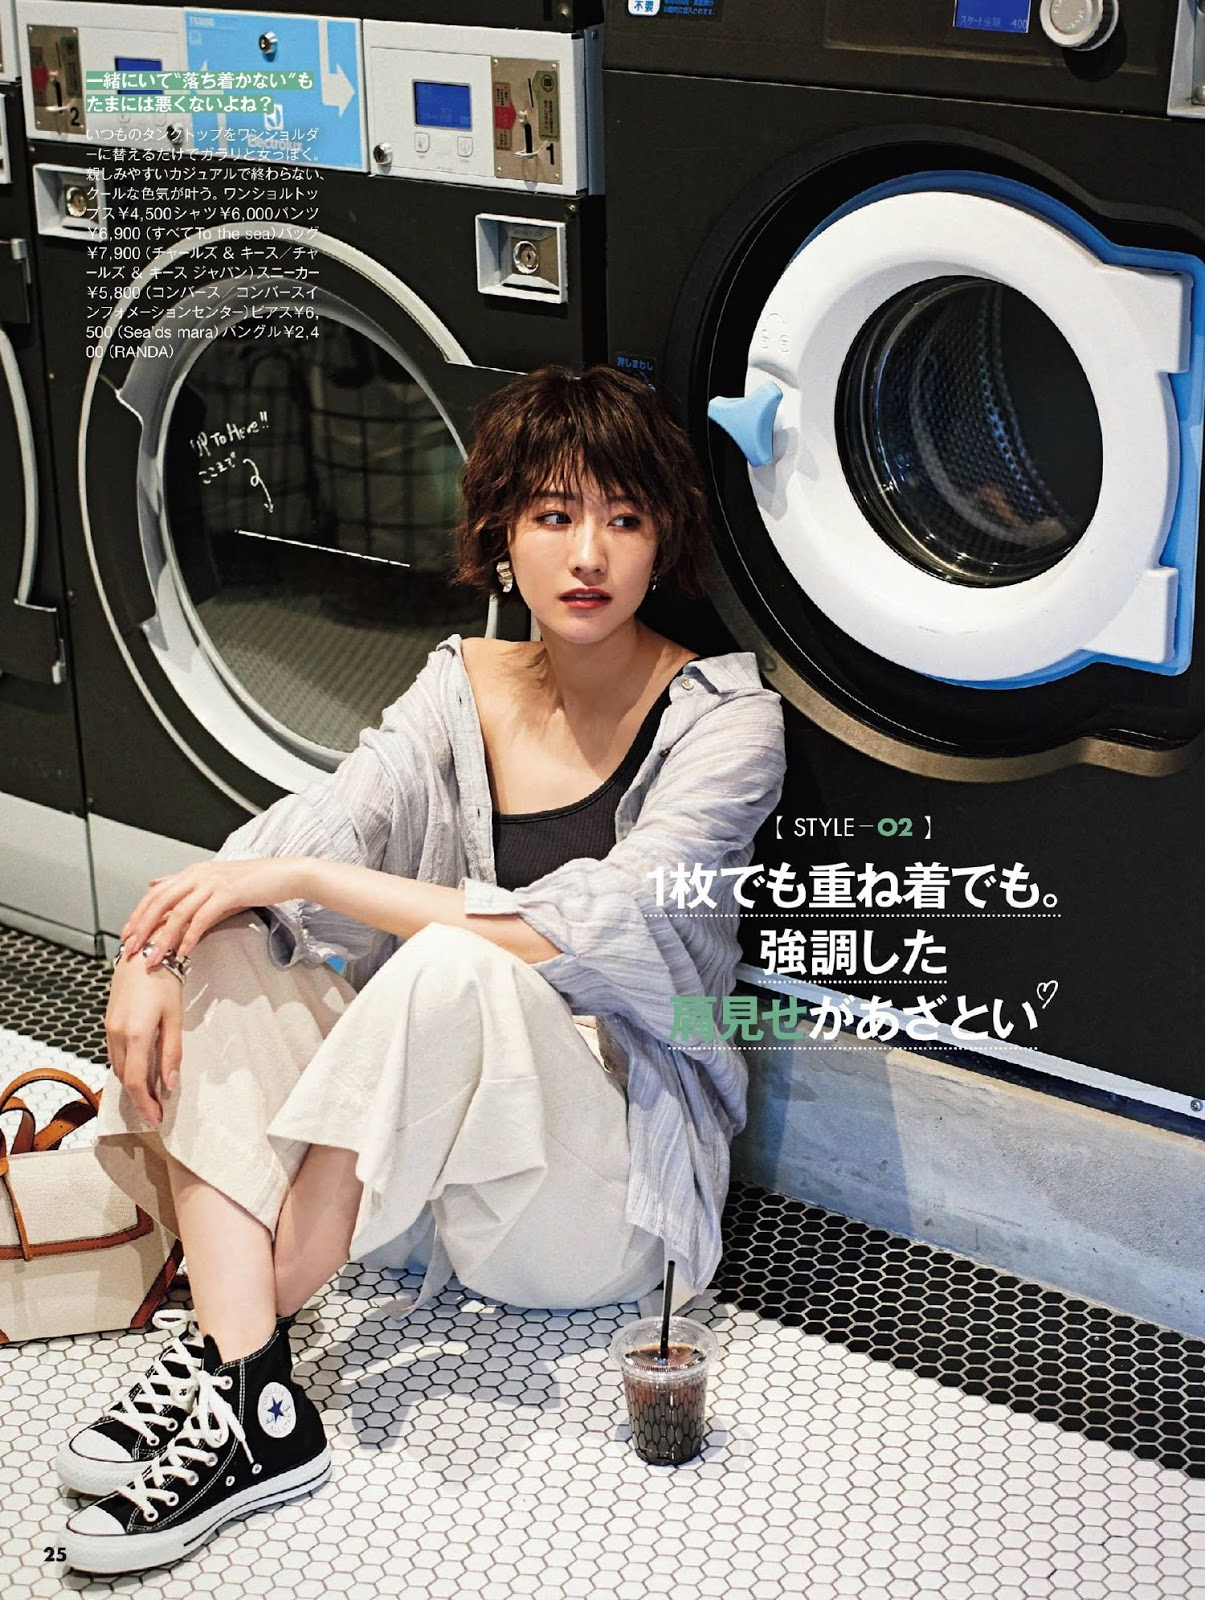 土生瑞穂  JJ Magazine 2020.05 - 亞洲美女 -